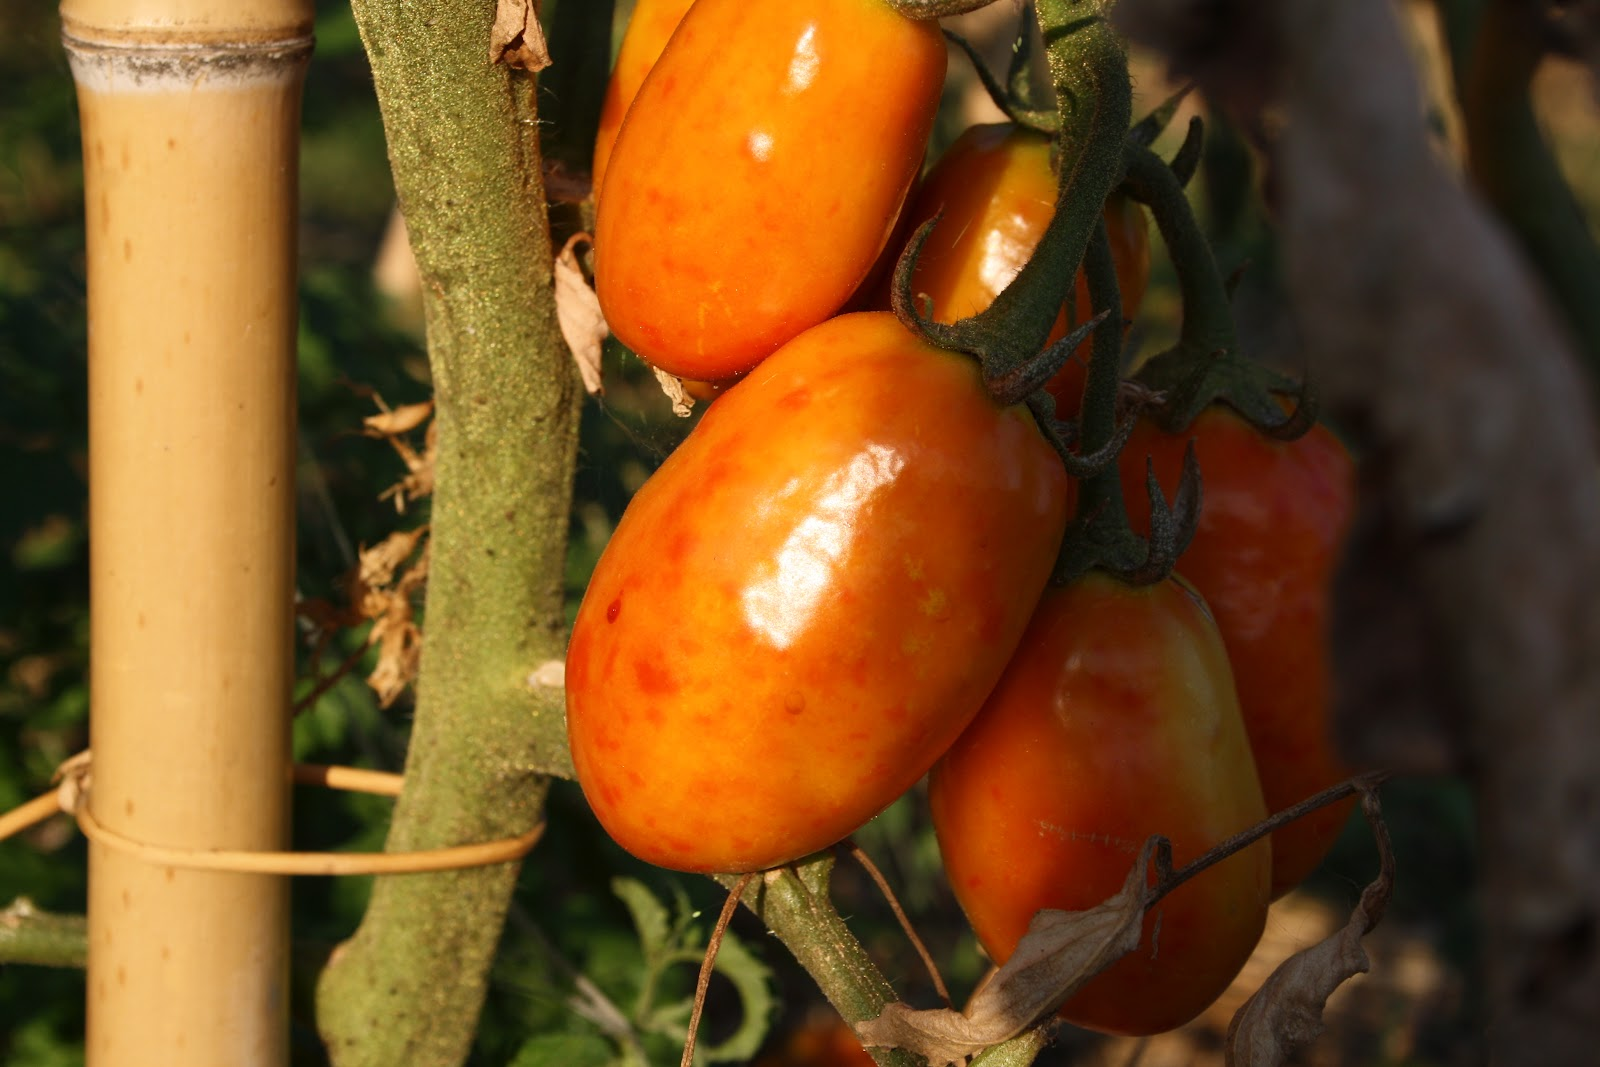 Losmogotes pomodoro d 39 agosto for Cimici nere